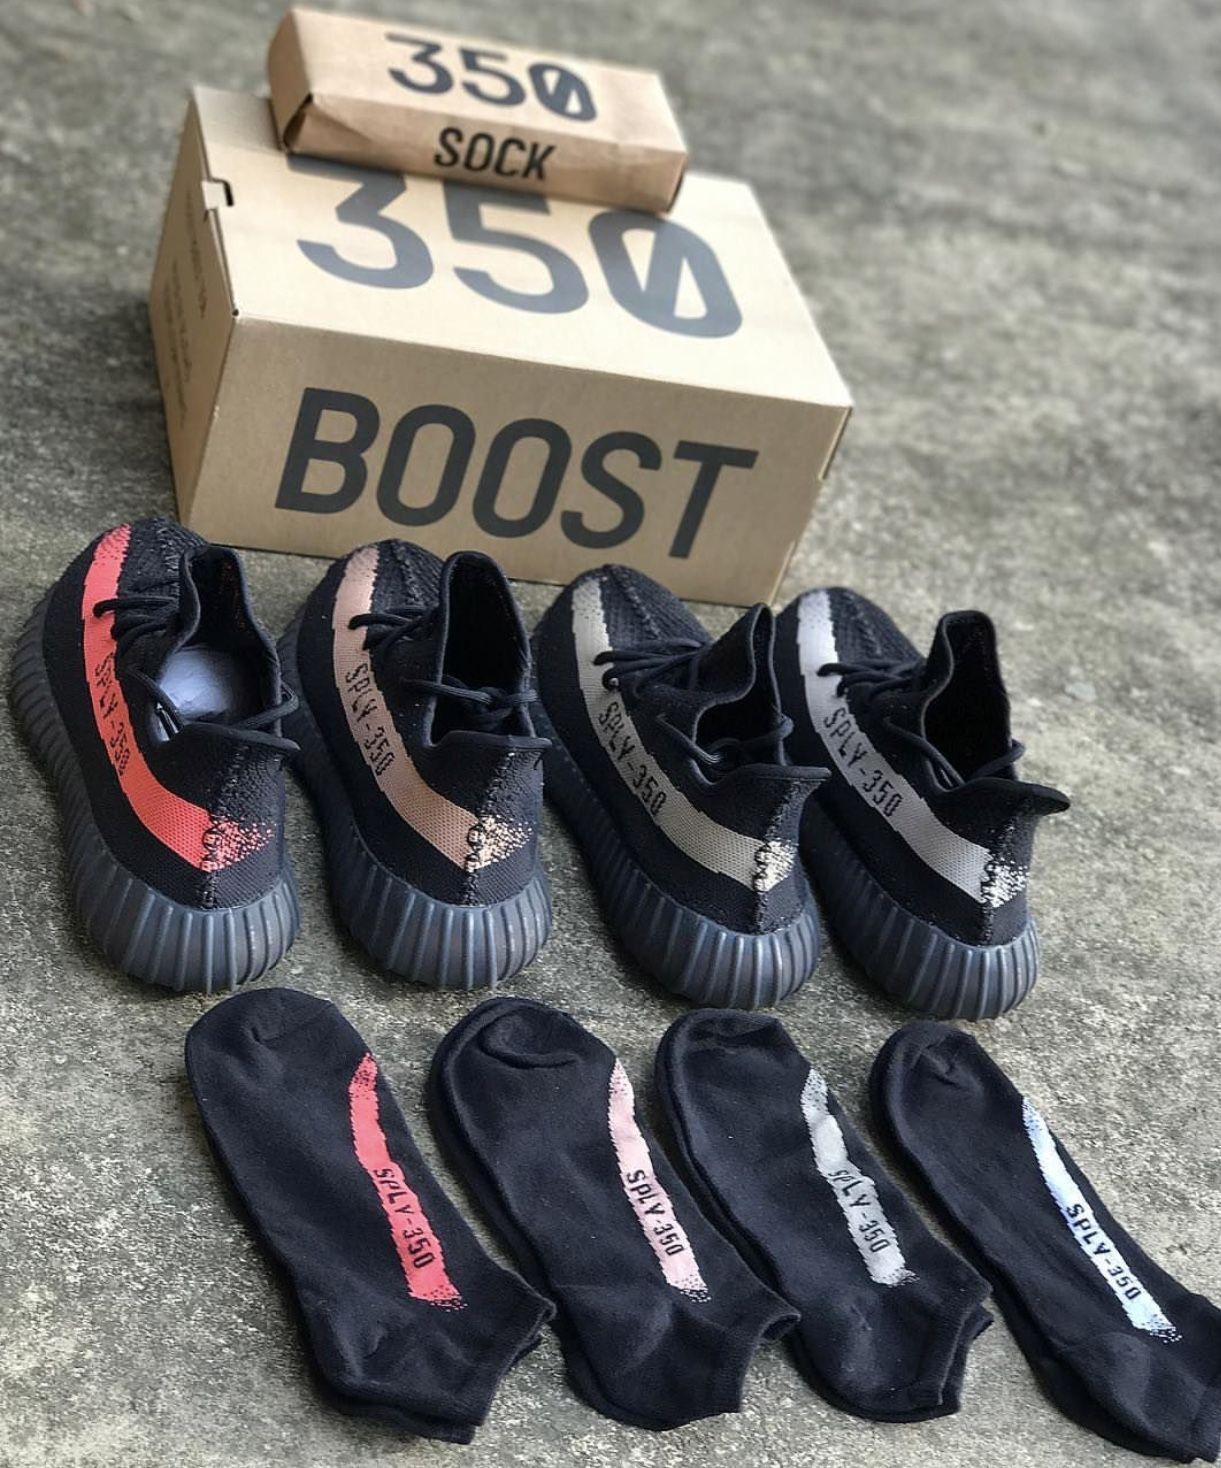 Yeezy Boost 350 V2 SPLY Sock Box \ufeff1 Box